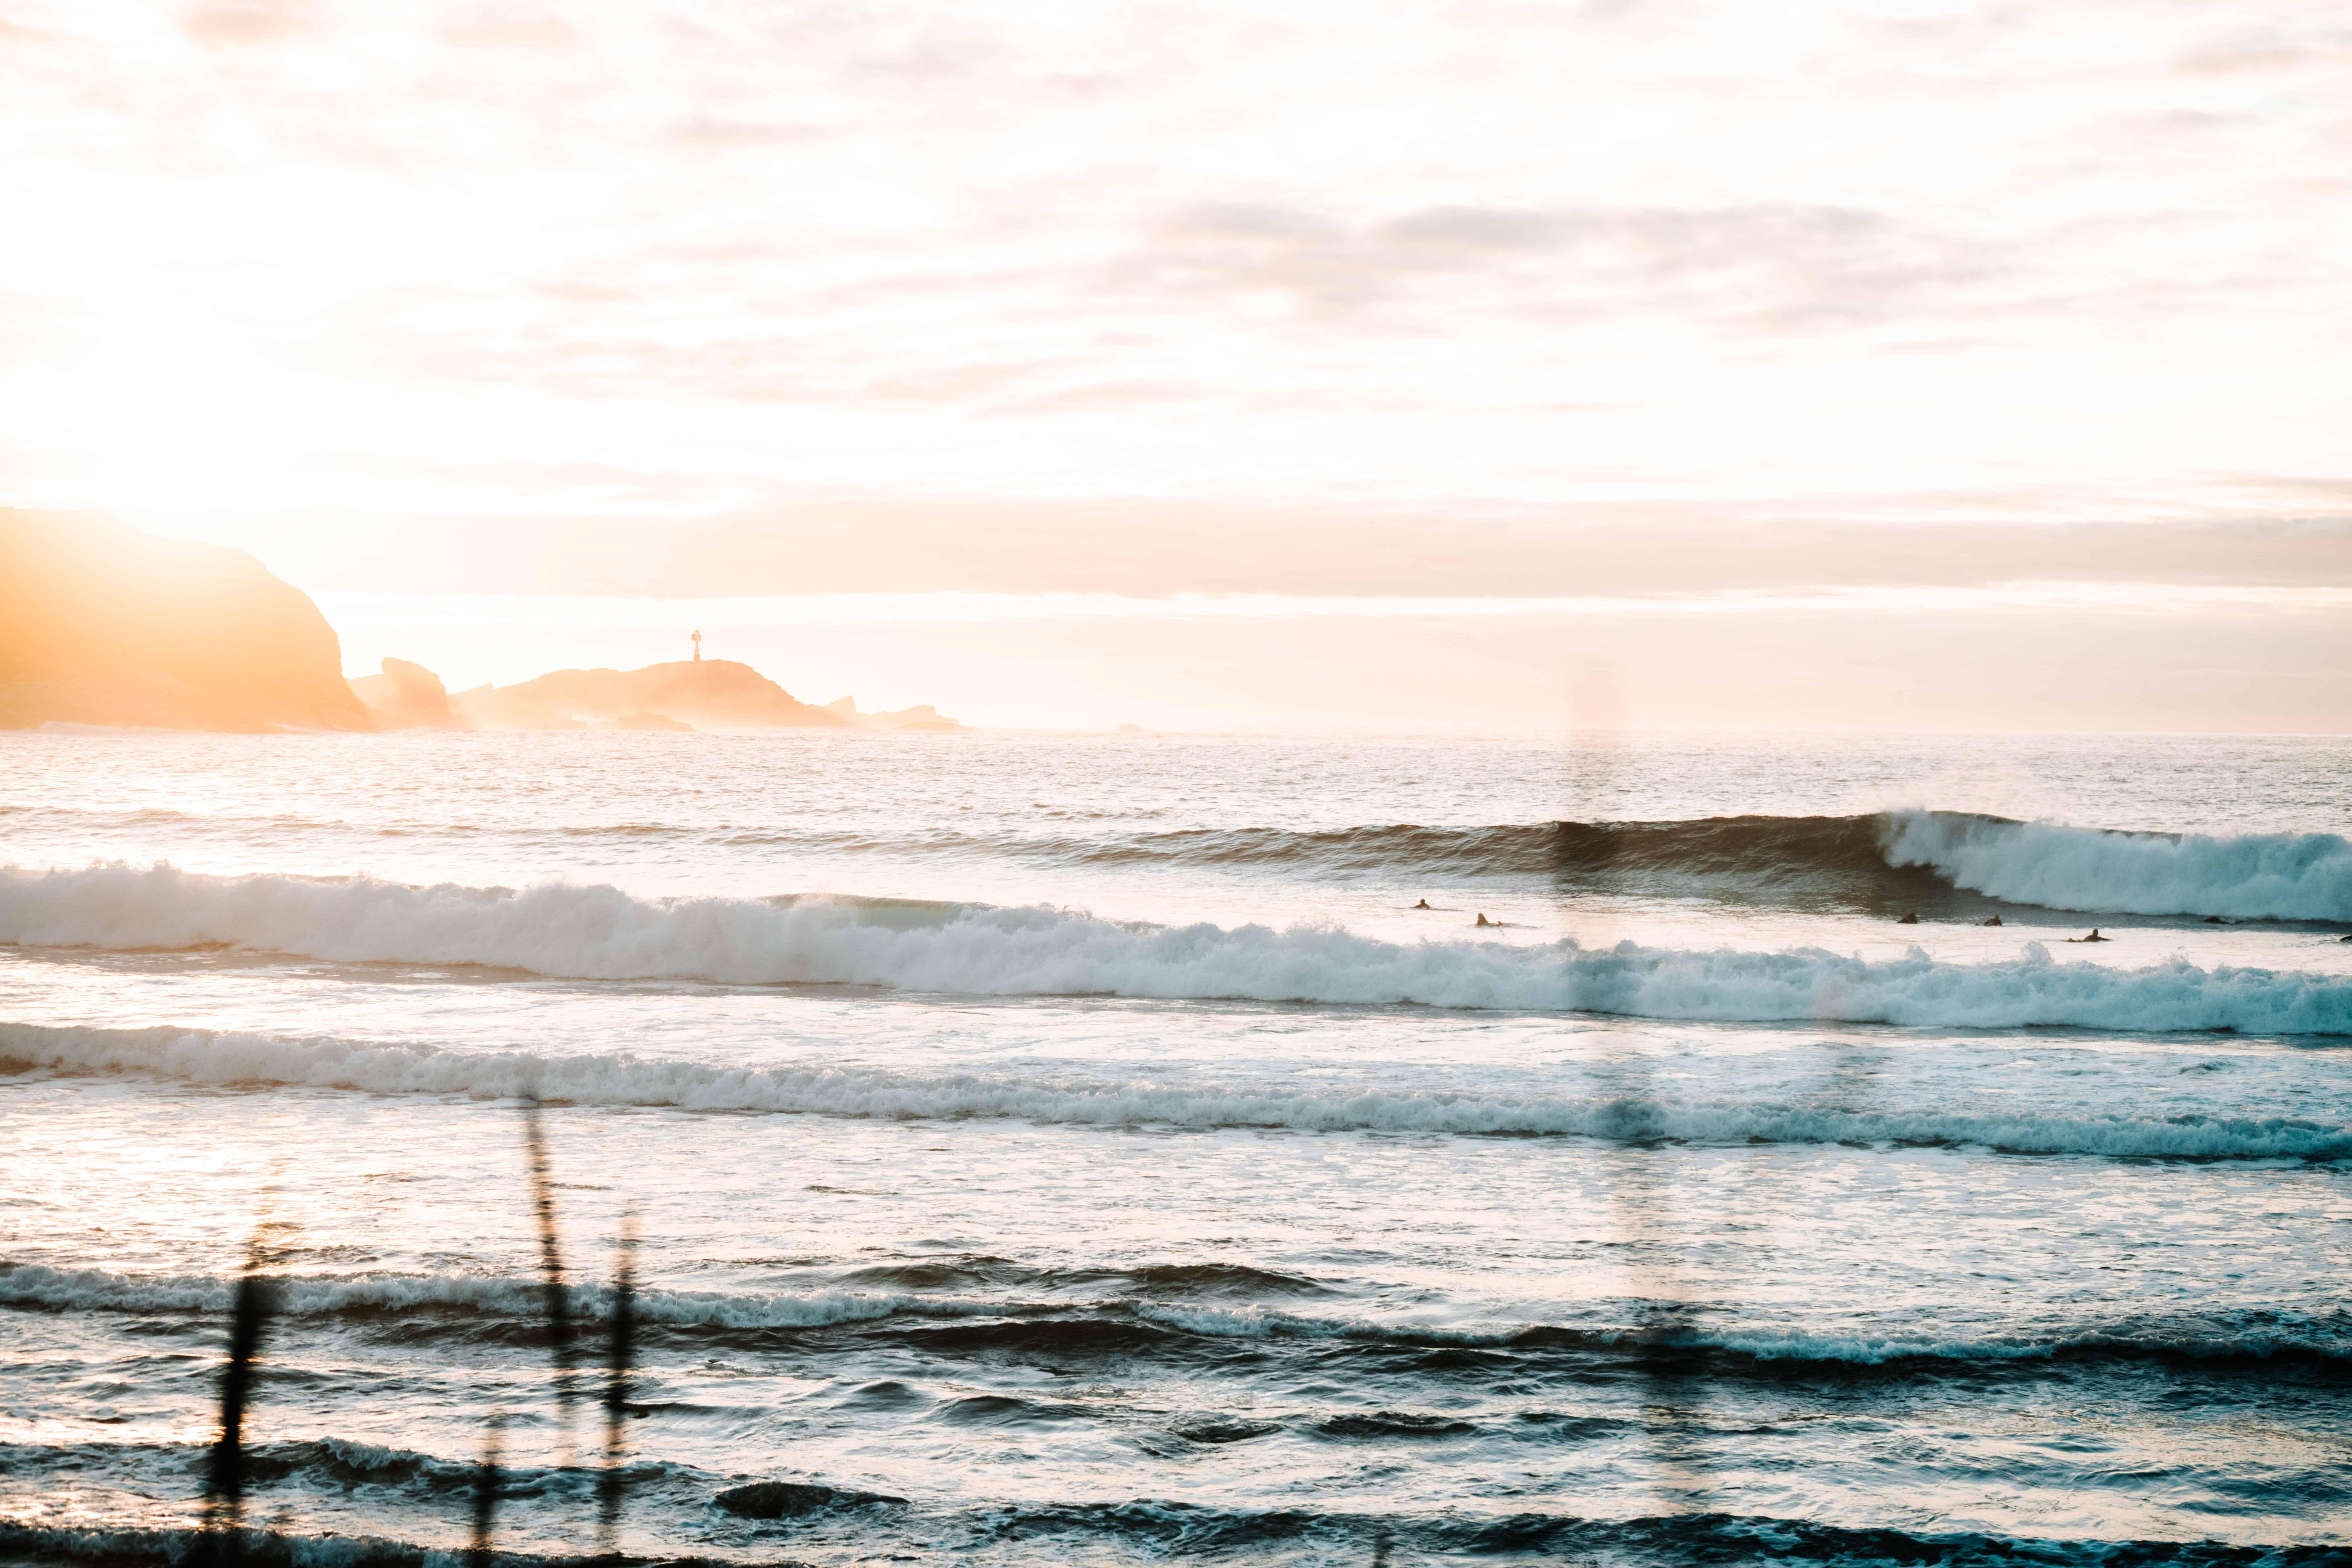 Bølgene linet opp perfekt på stad. Foto: Saltnwax